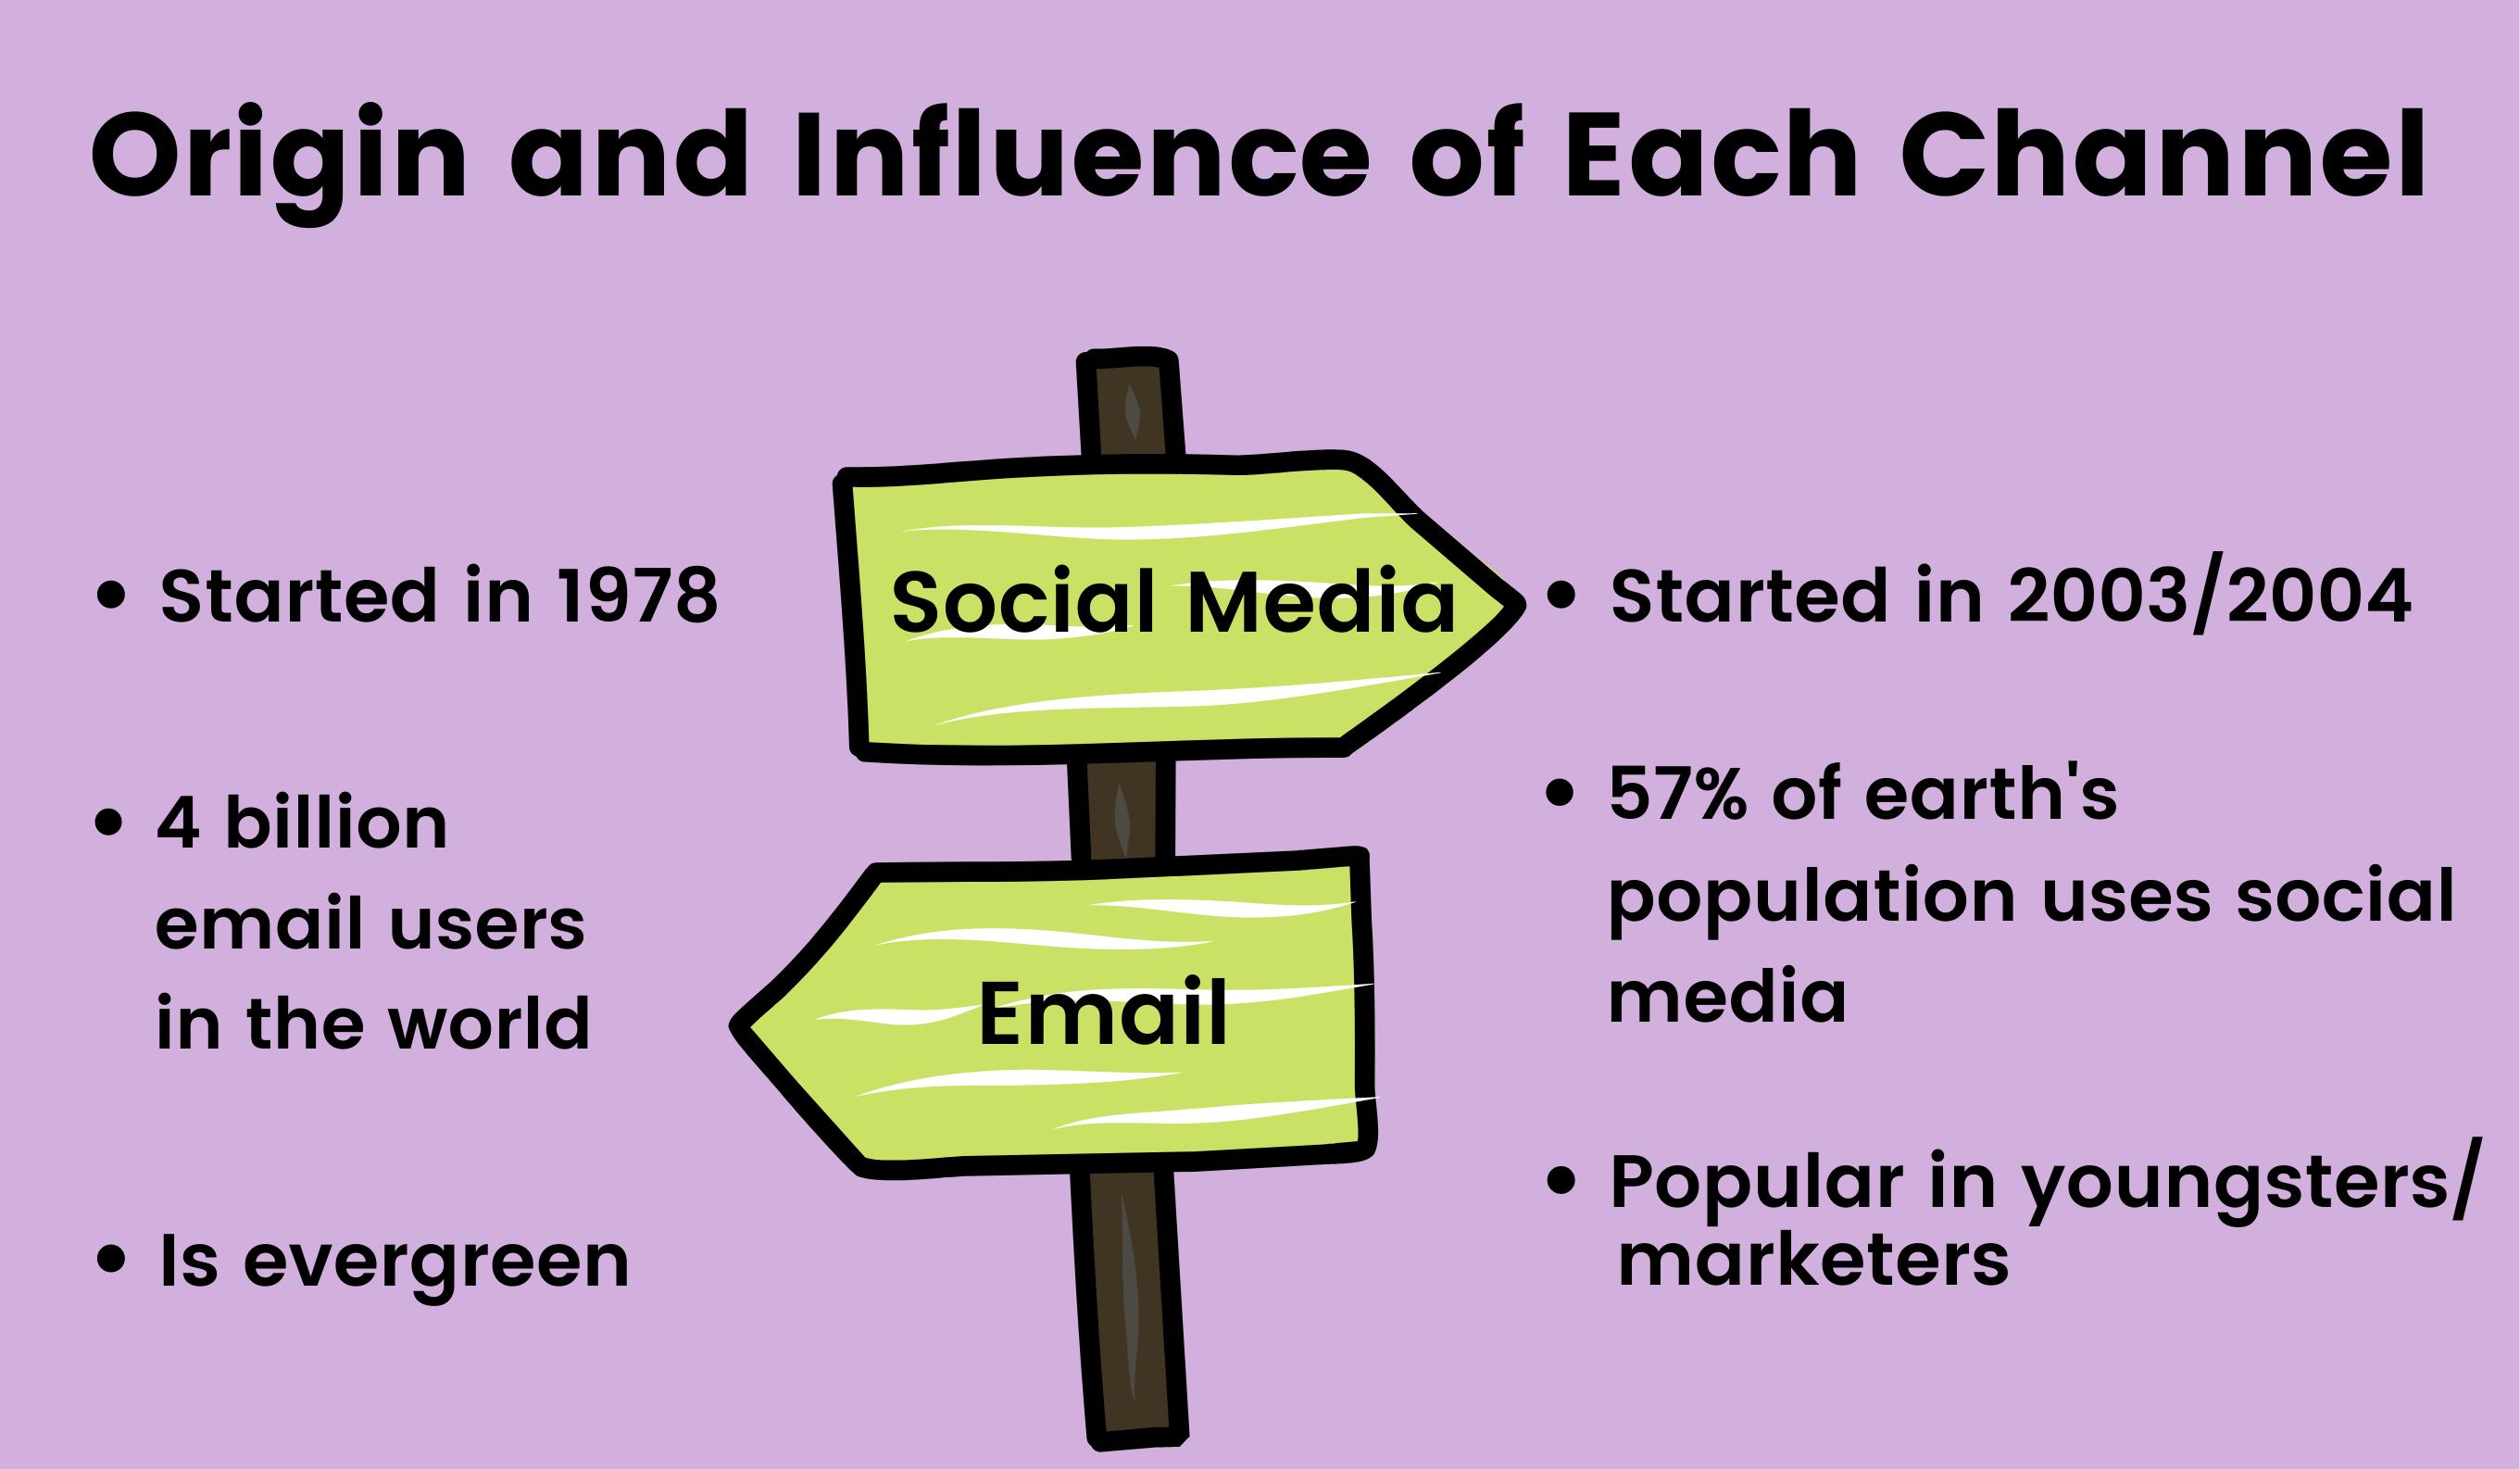 Origin of email marketing and social media